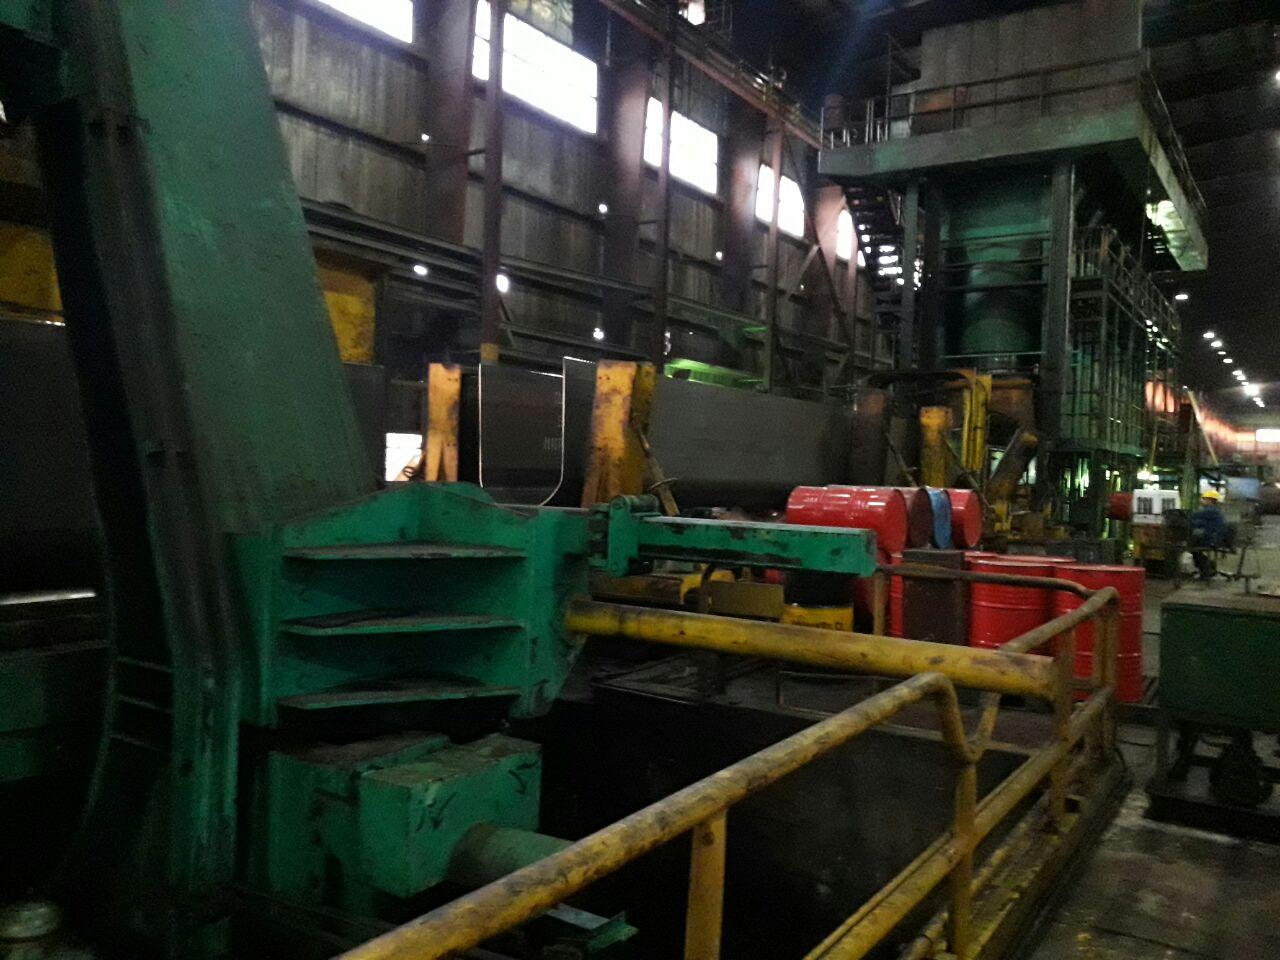 IMG 20200502 063810 430 شرکت لولهسازی اهواز در سال جهش تولید ظرفیت همکاری با صنایع را افزایش داد